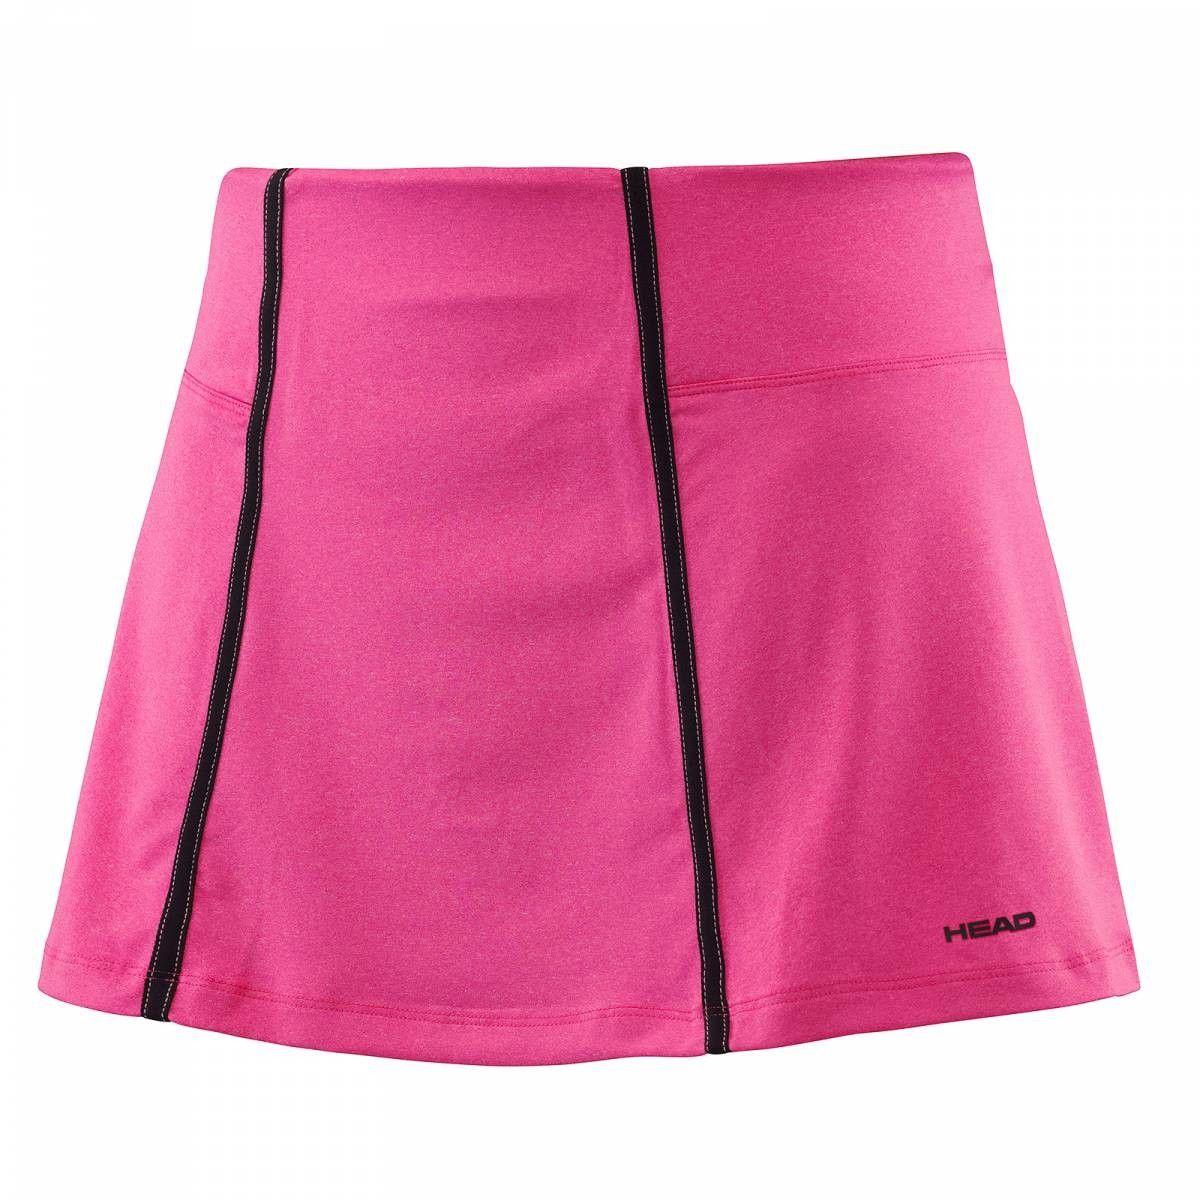 Head Vision W Bianca Skirt - pink 814226-PK